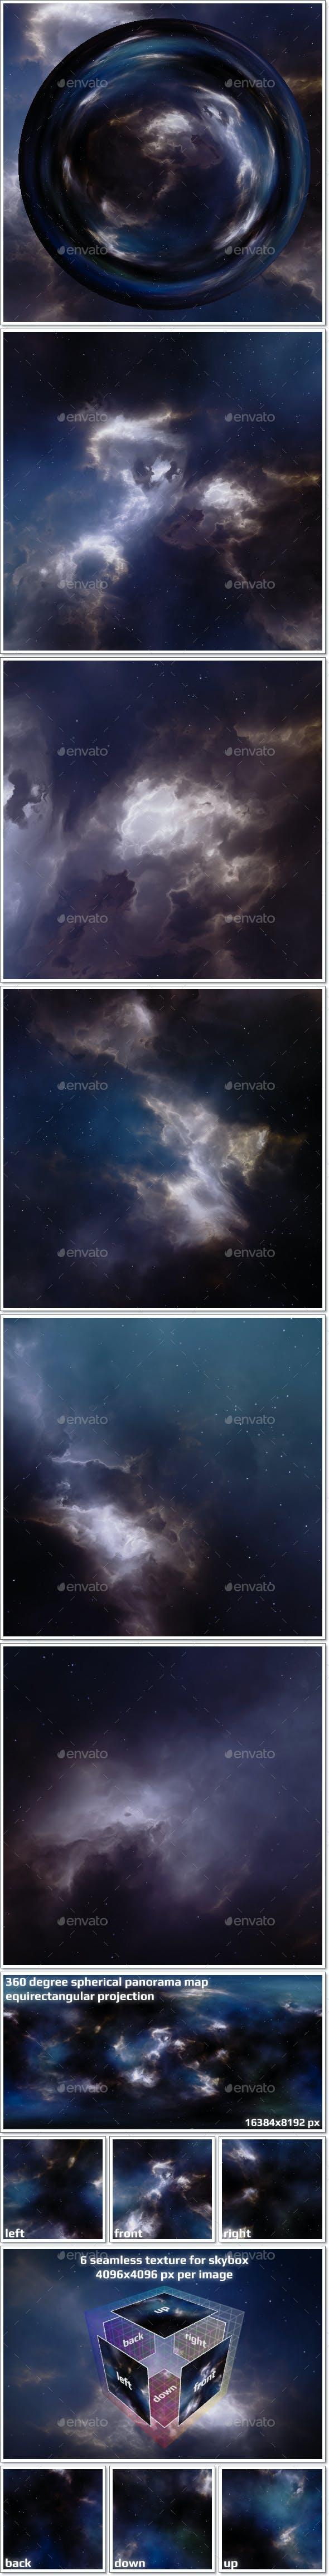 Nebula Space Environment HDRI Map 016 - 3DOcean Item for Sale